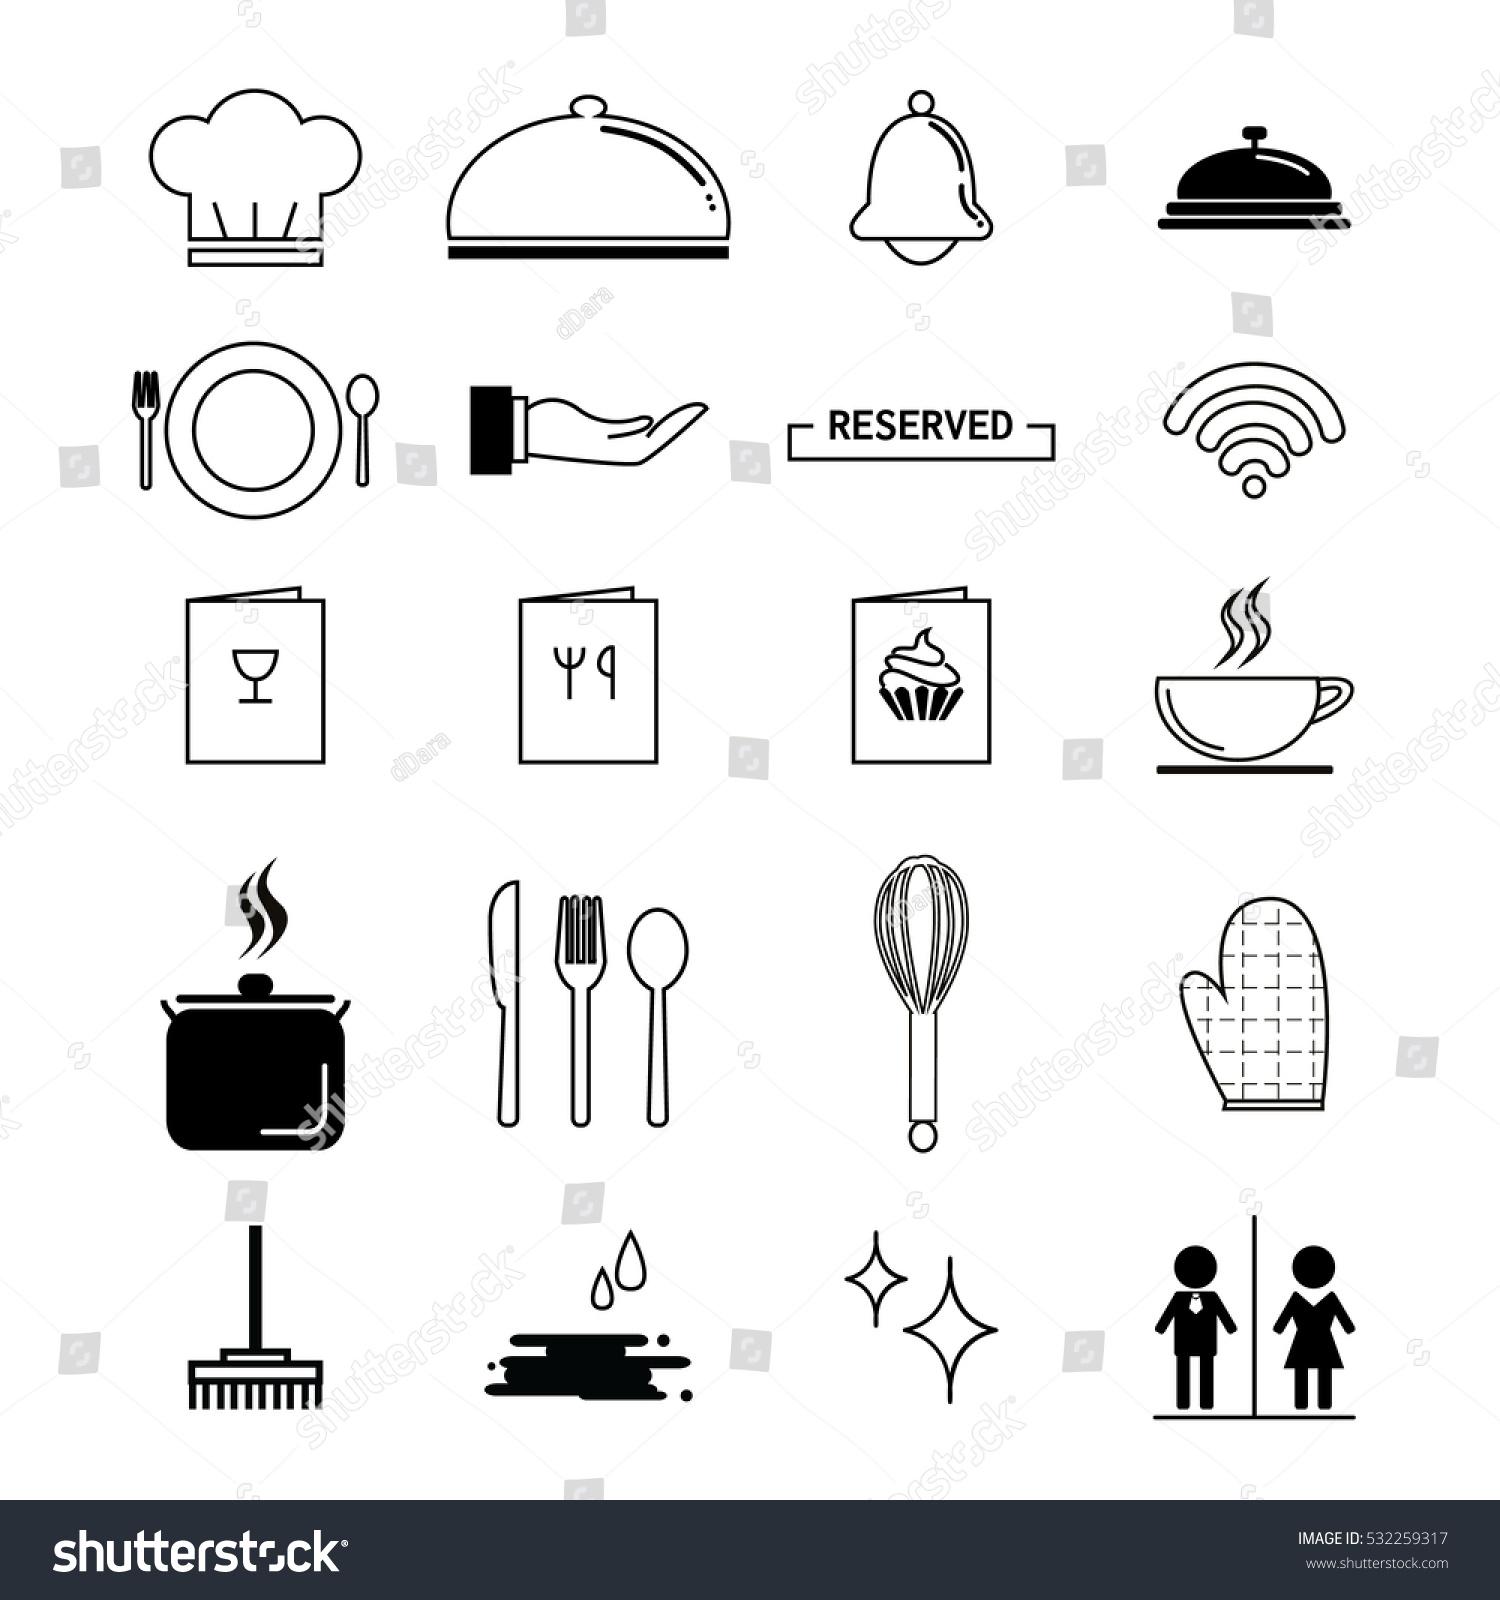 Kitchen icons set for restaurant stock vector illustration for Kitchen set vector